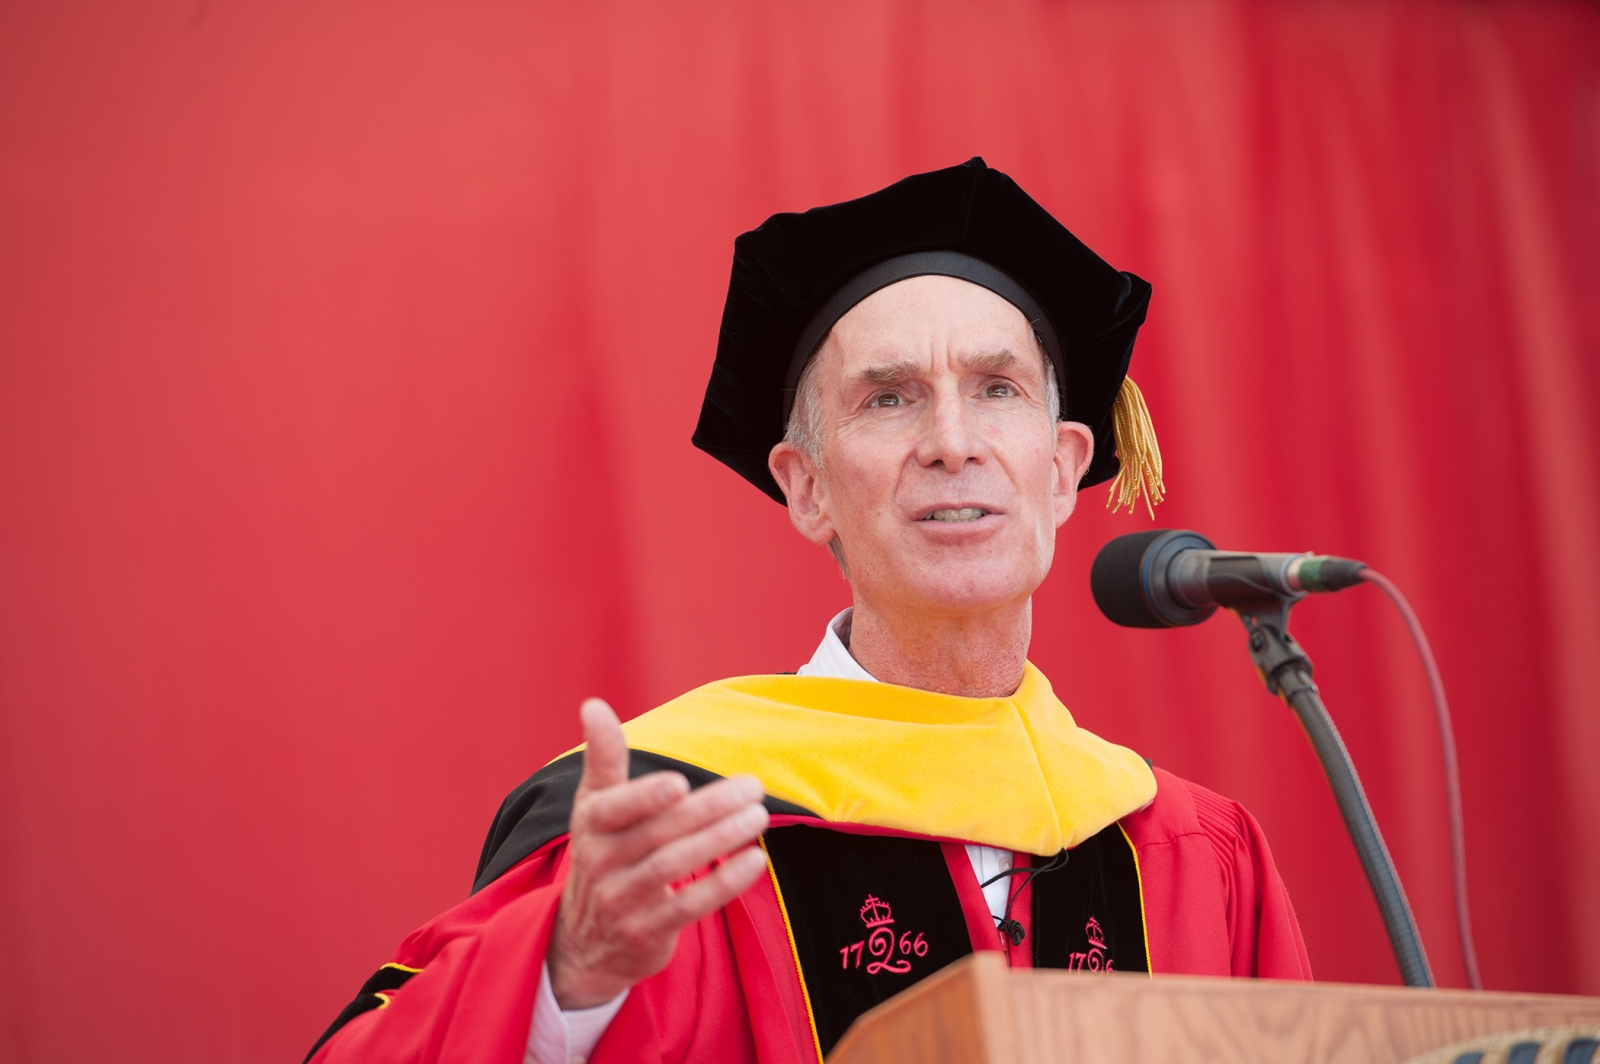 Bill Nye science guy rutgers